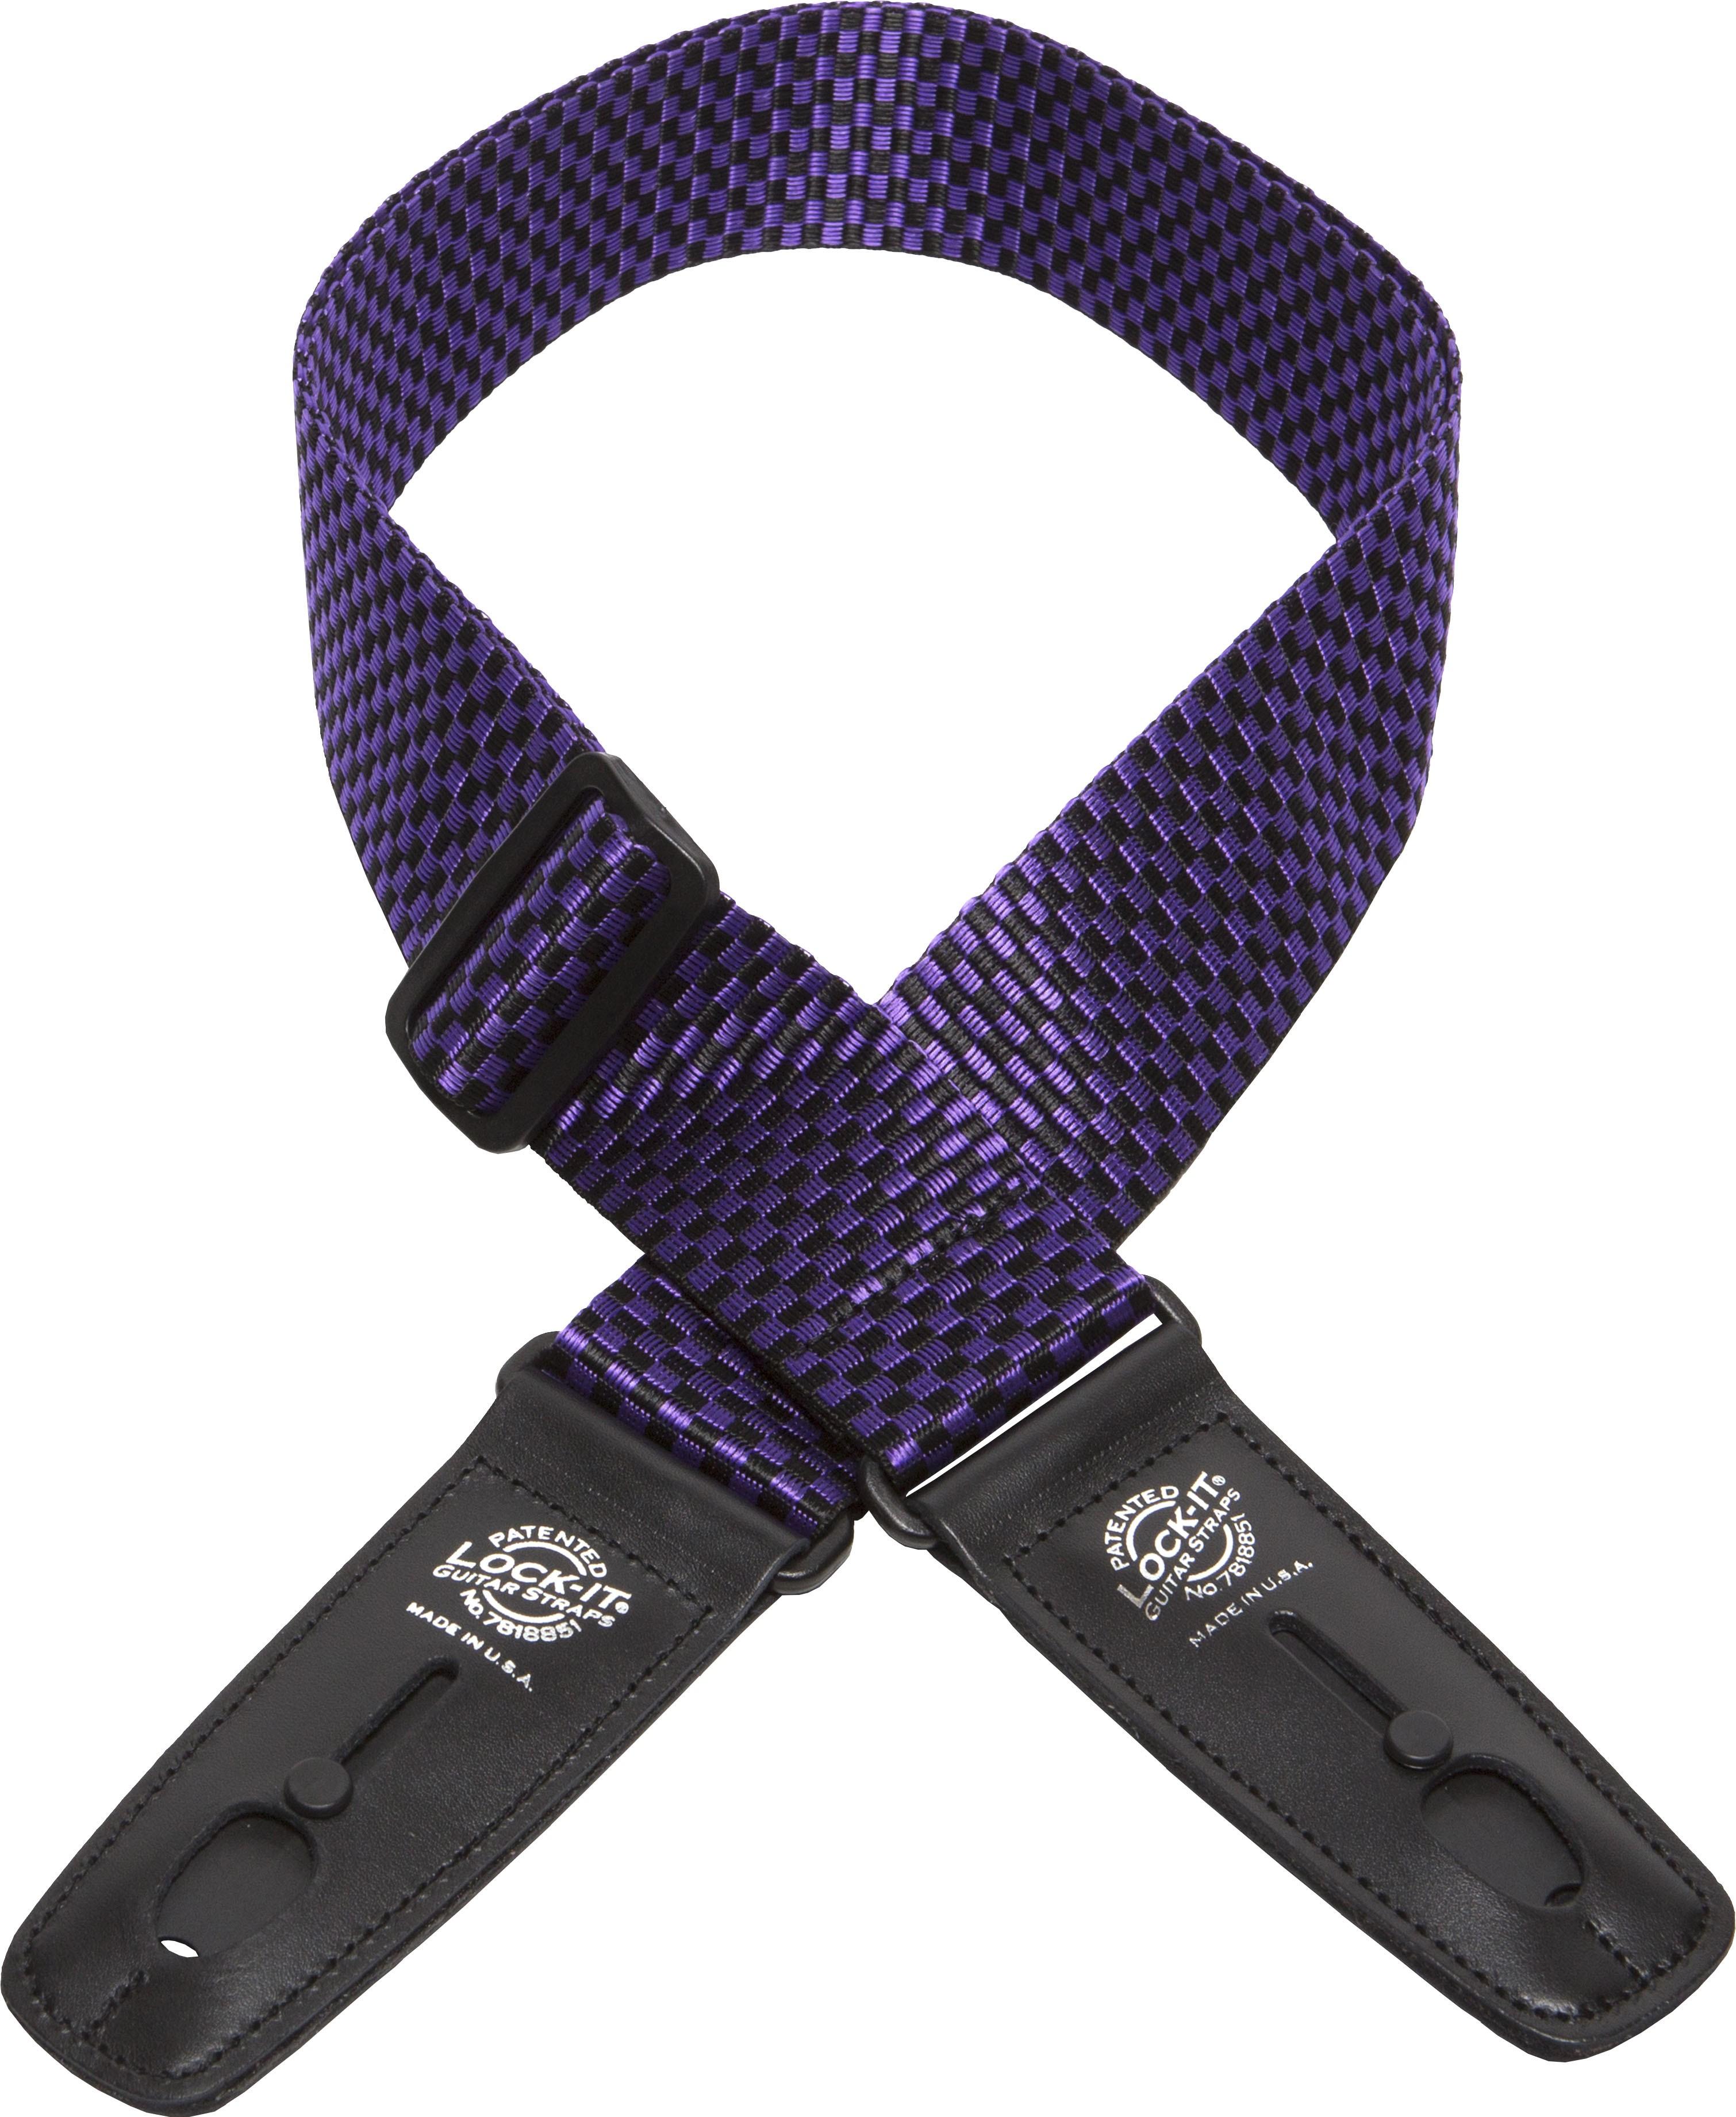 Lock-It 2 Inch PolyPro Strap - Purple Check